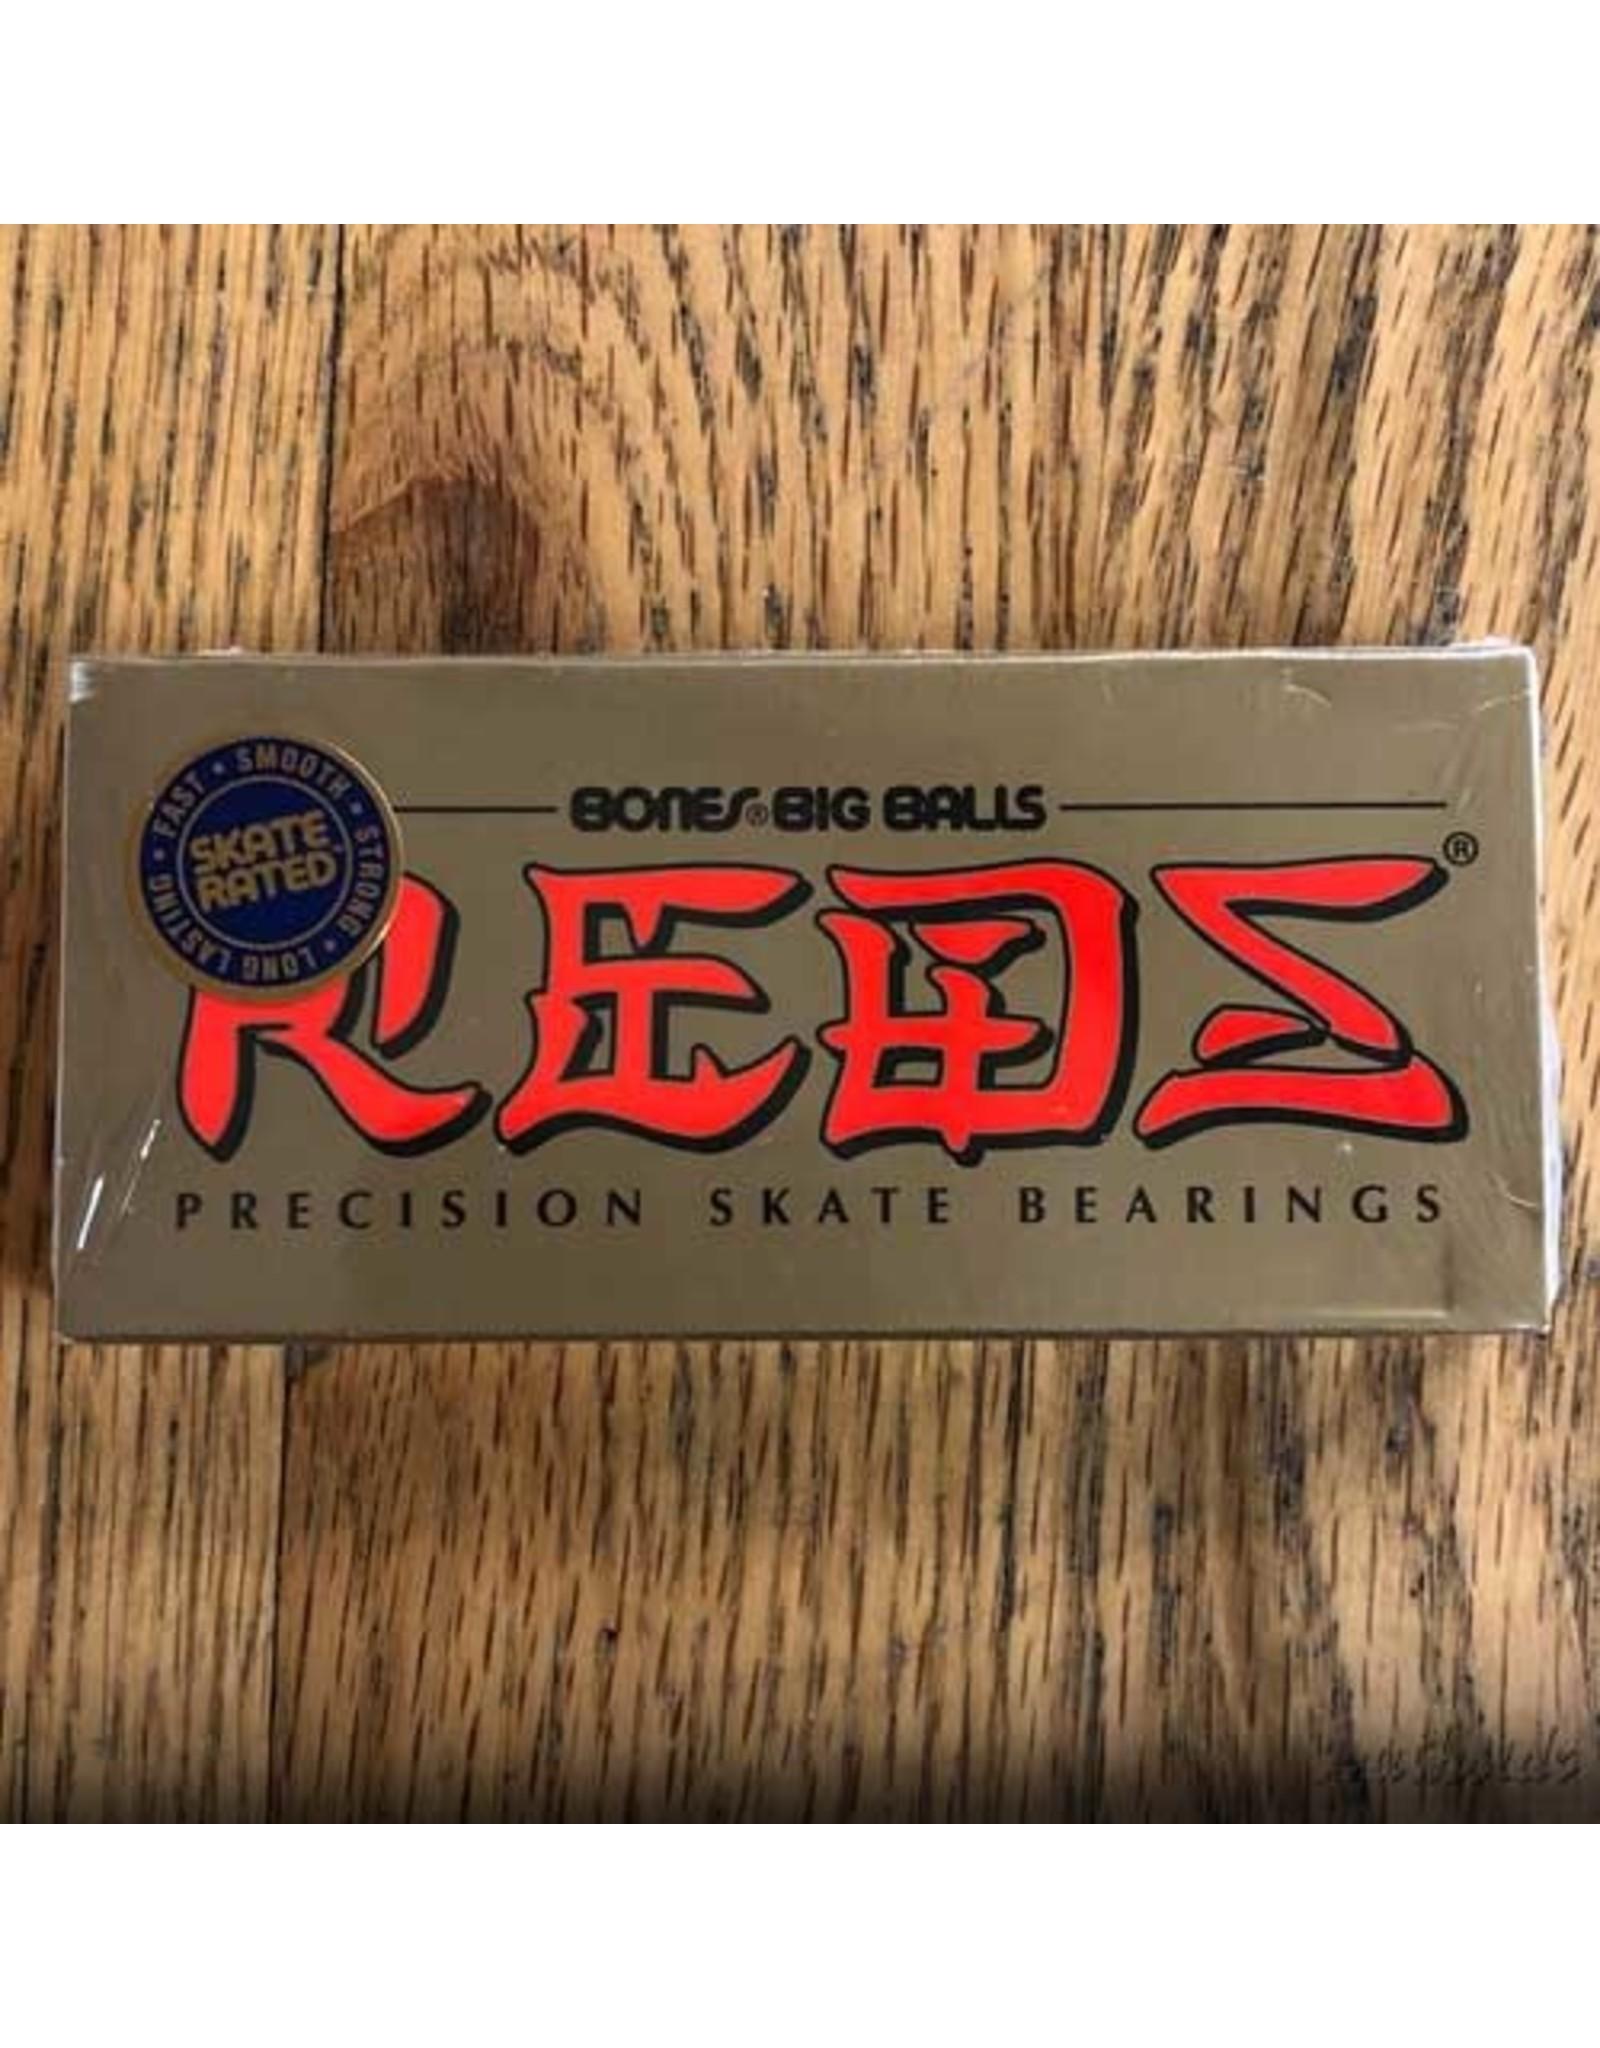 Bones Big Balls Reds Bearings